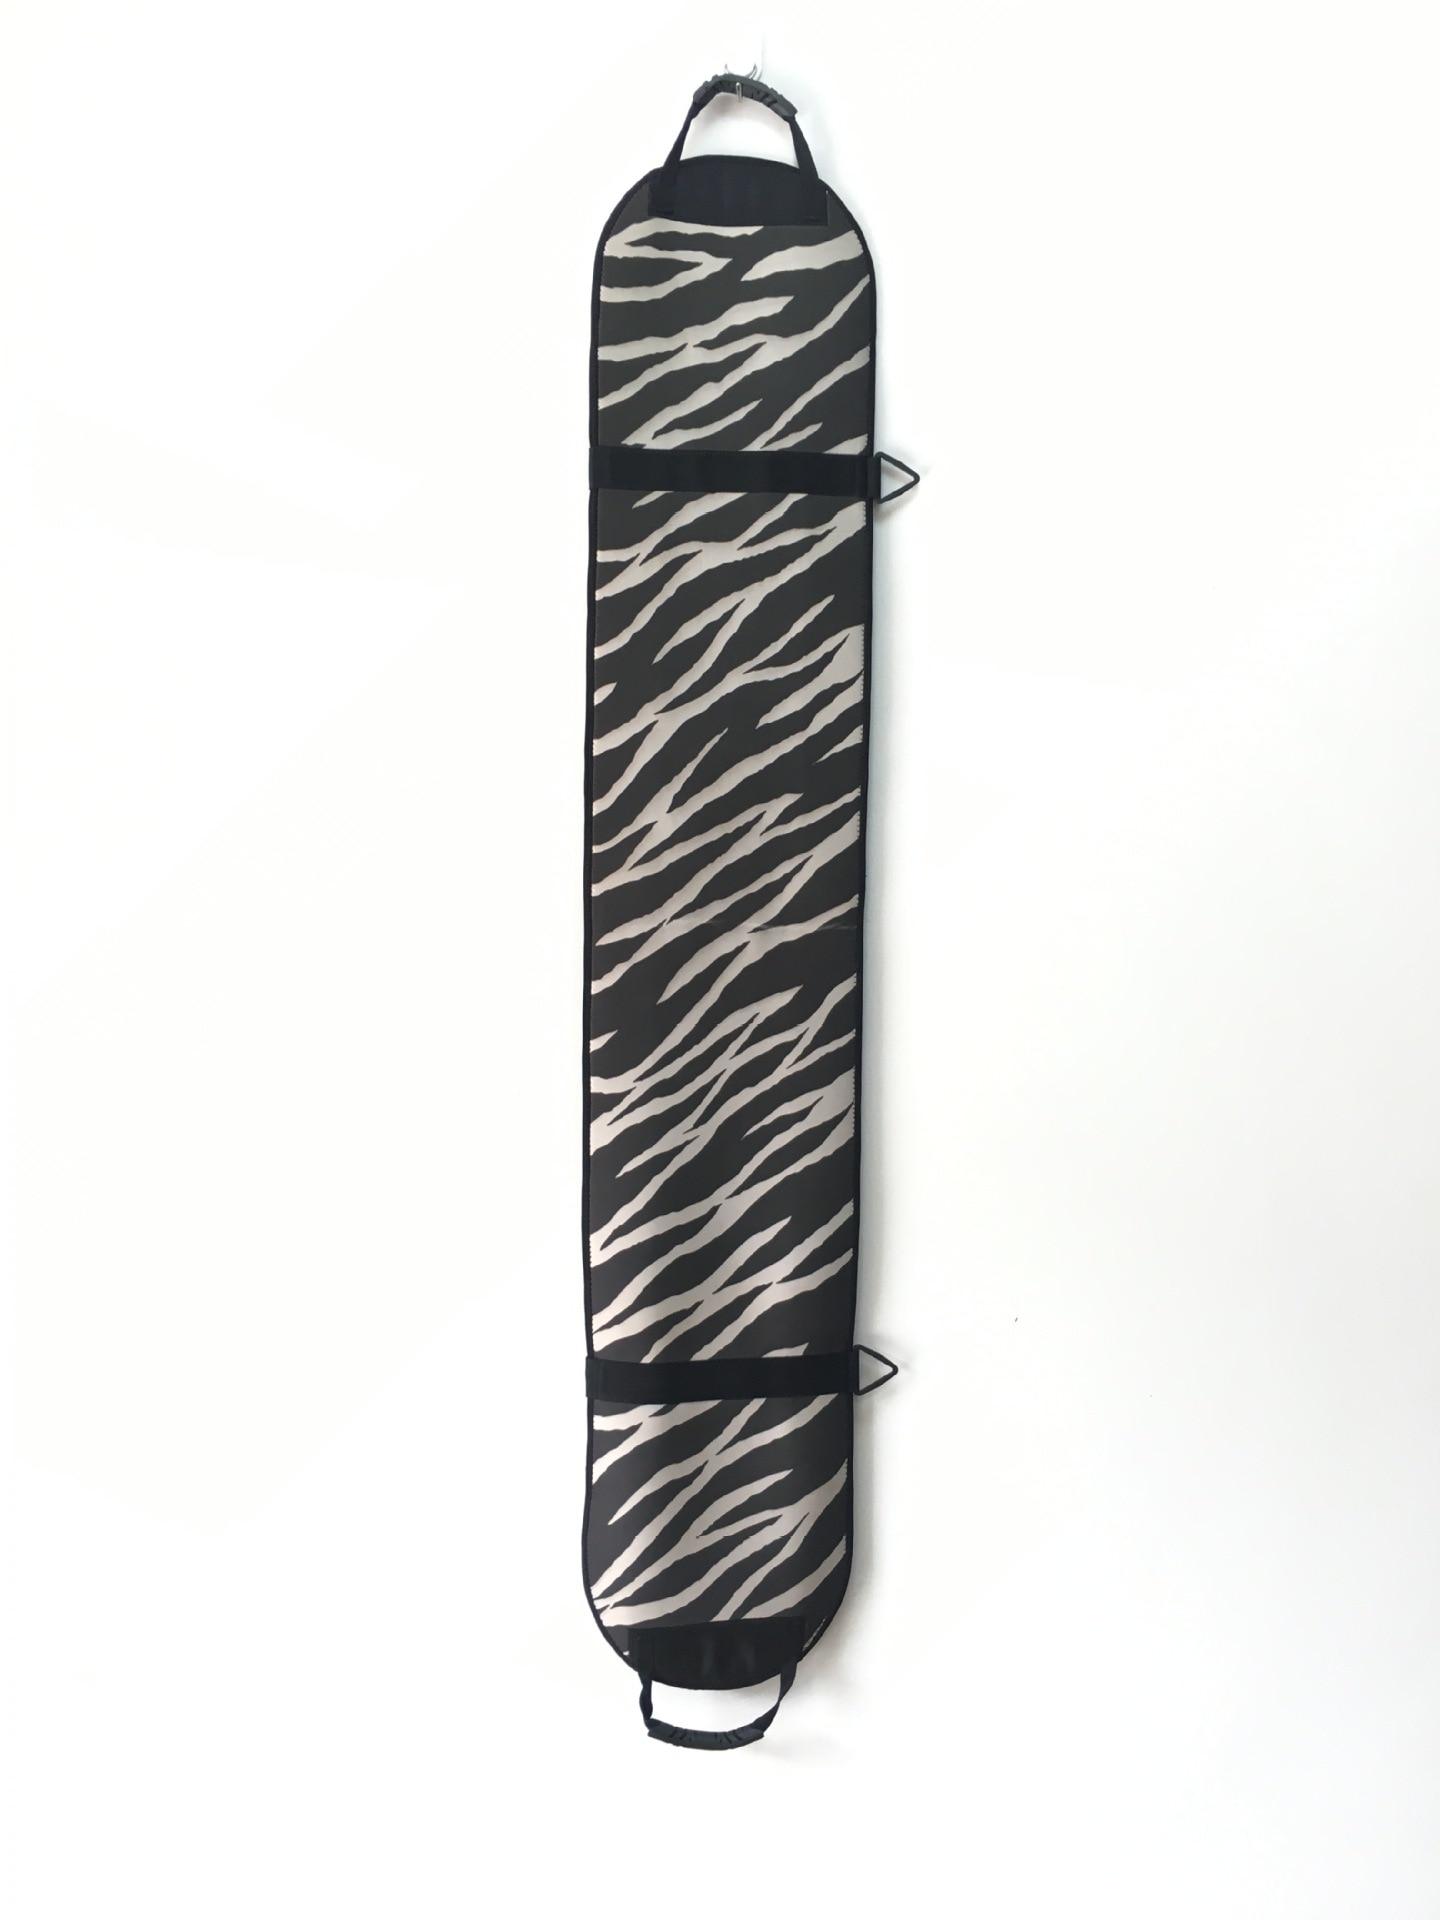 Sac de ski de plein air portable pack de ski snowboard placage fournitures de ski A5212 - 2